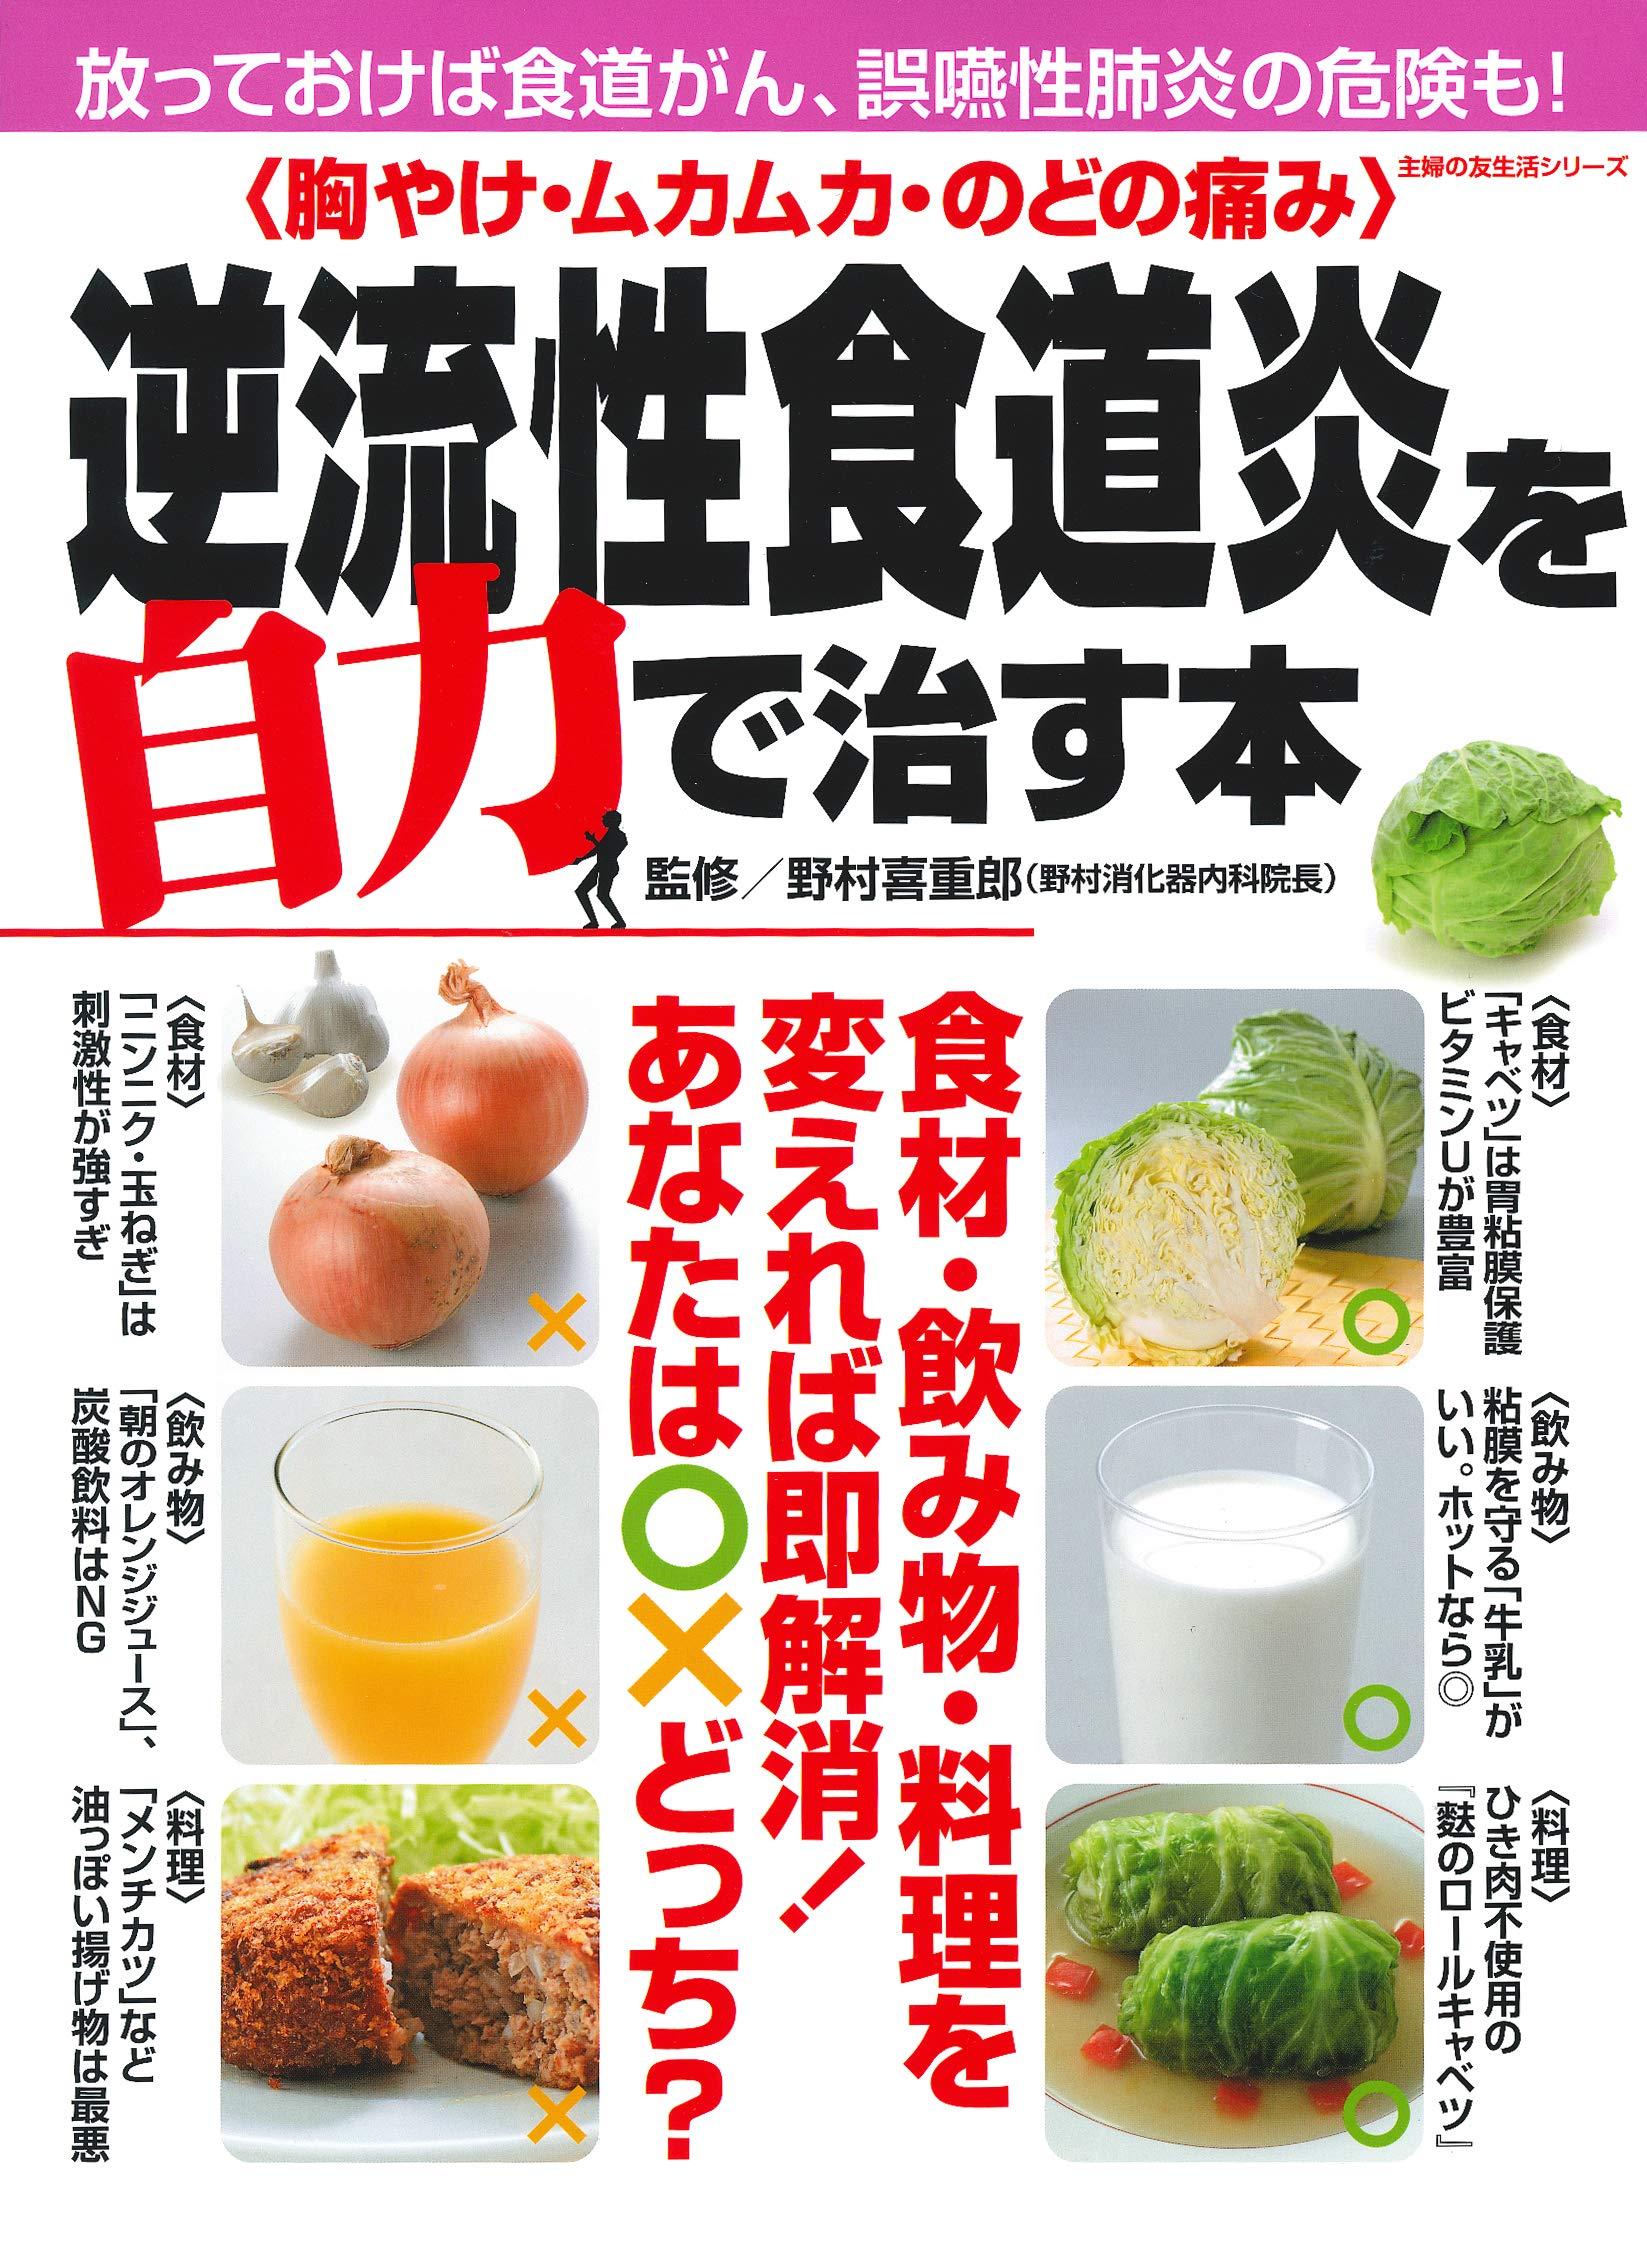 飲み物 食道 逆流 性 炎